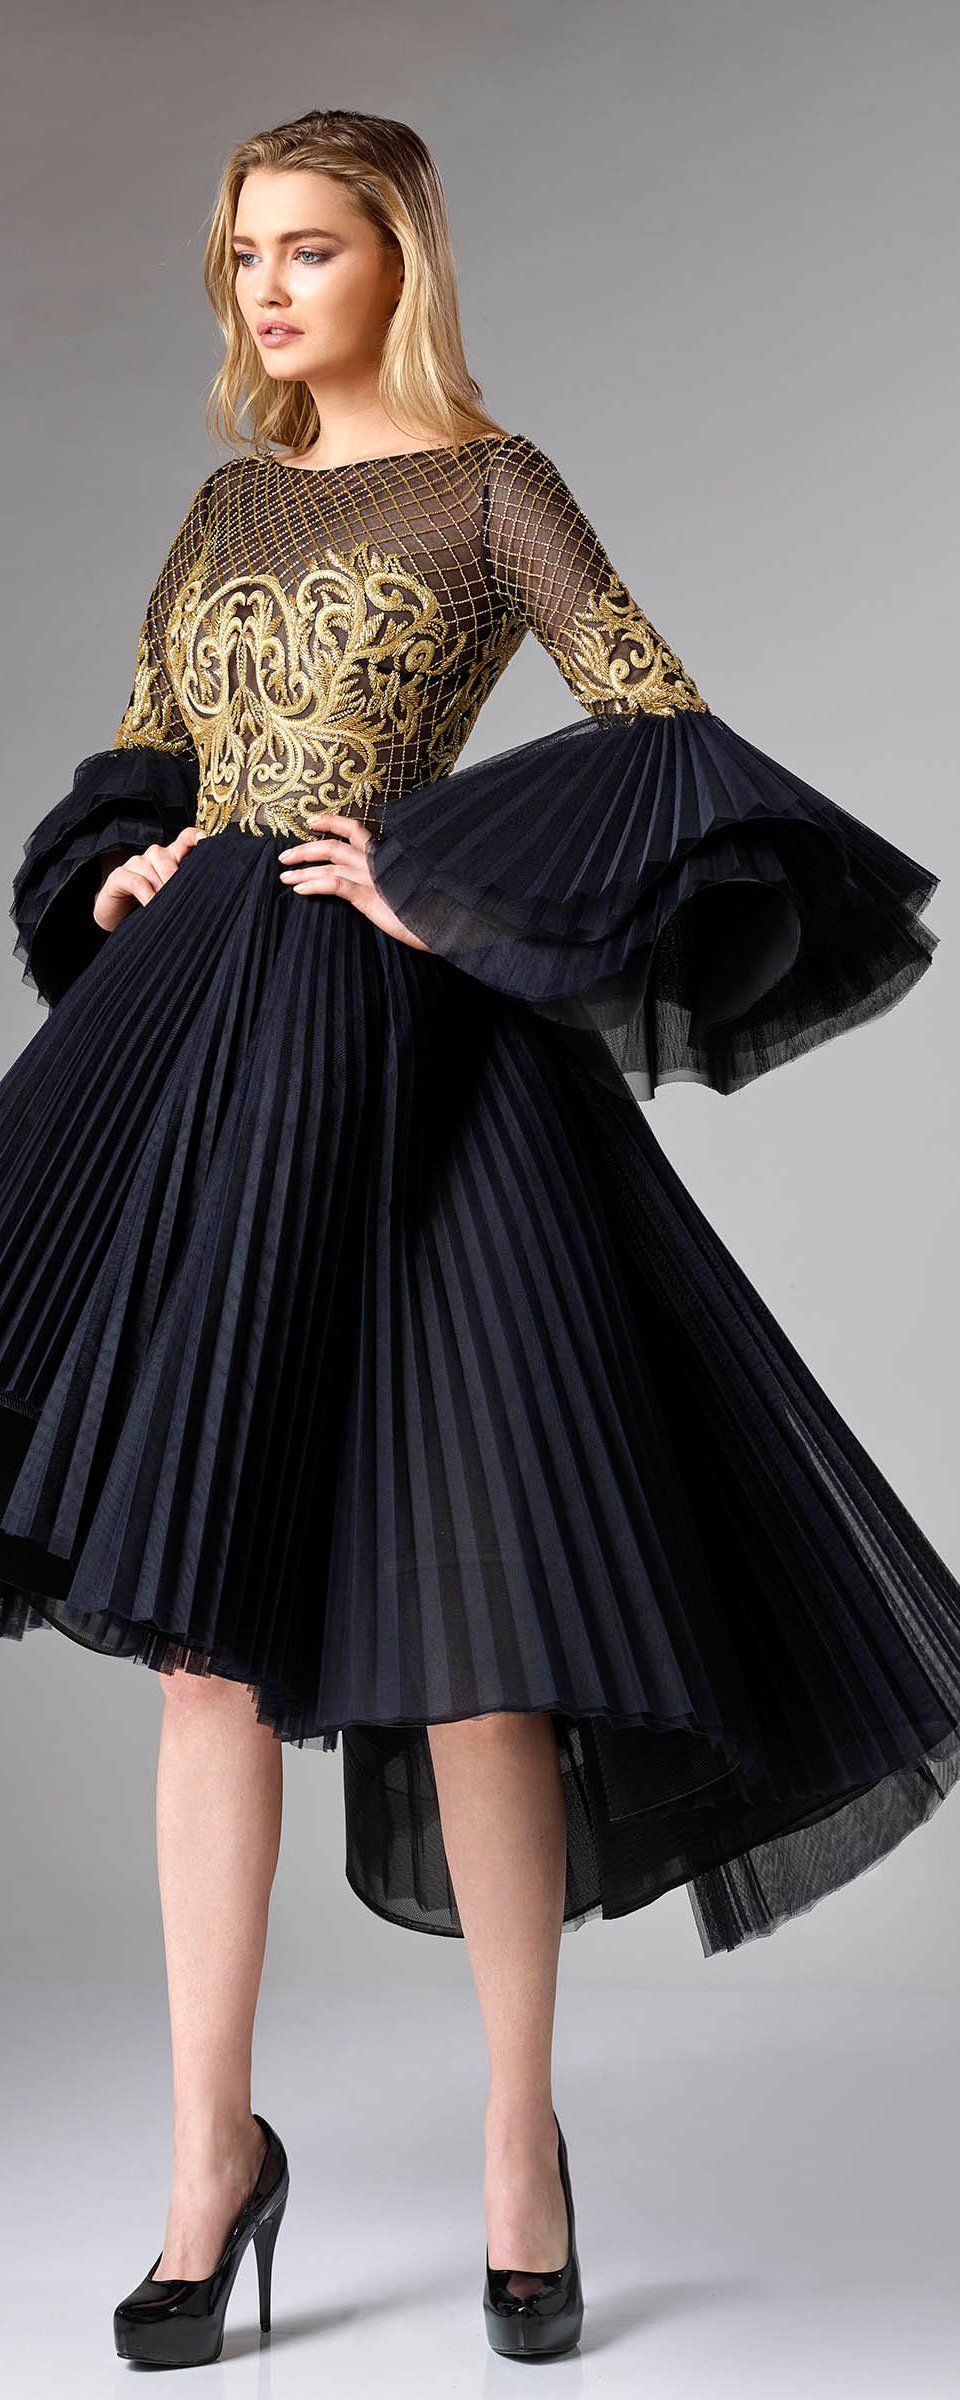 Lace dress midi march 2019 Edward Arsouni ucDivinaud FW   Couture  Haute Couture